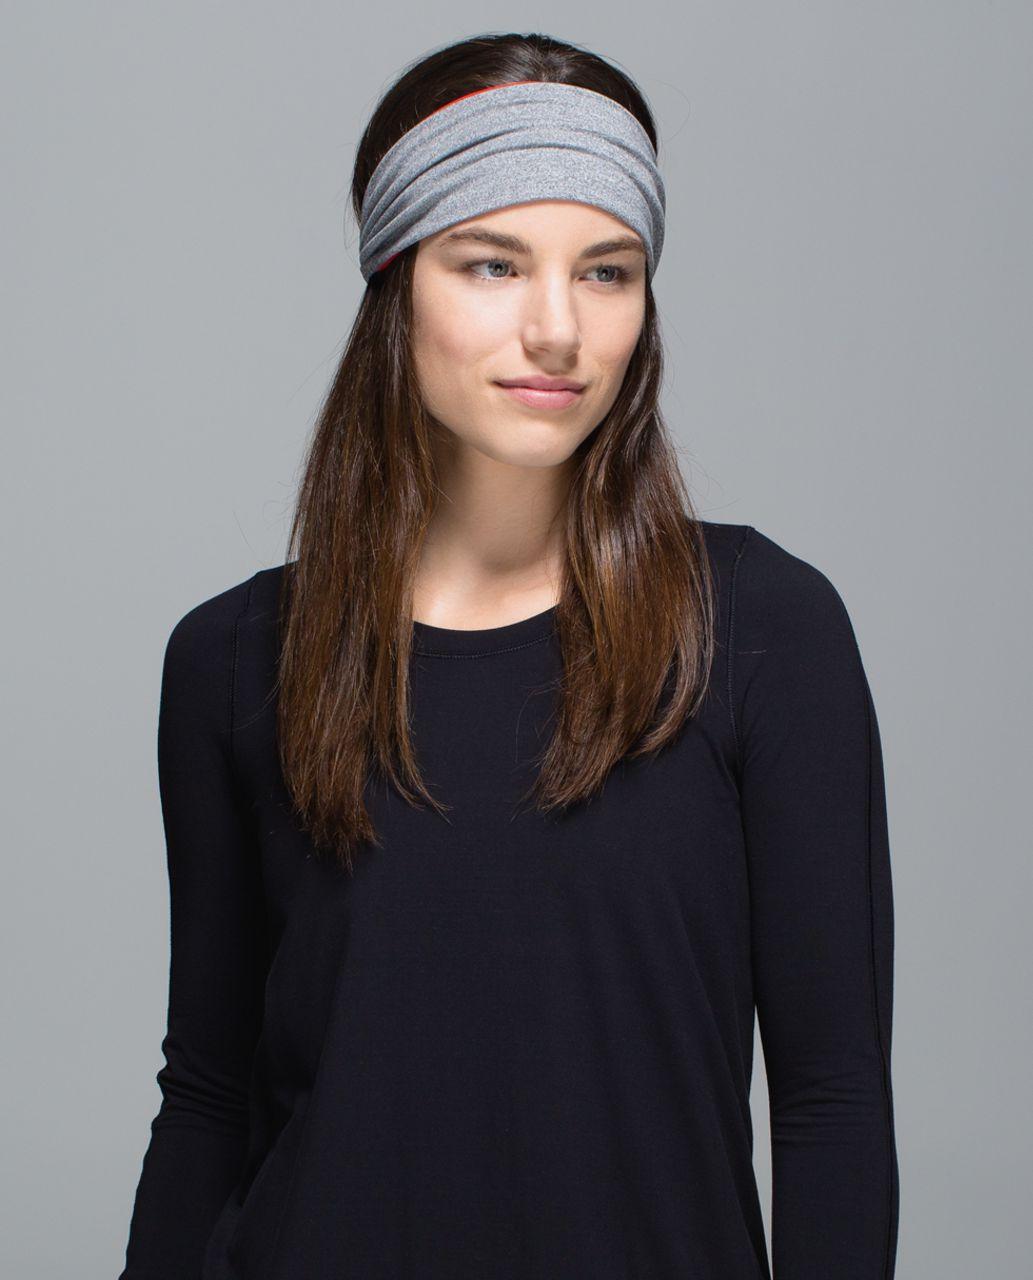 Lululemon Bang Buster Headband *Reversible - Heathered Slate / Flaming Tomato